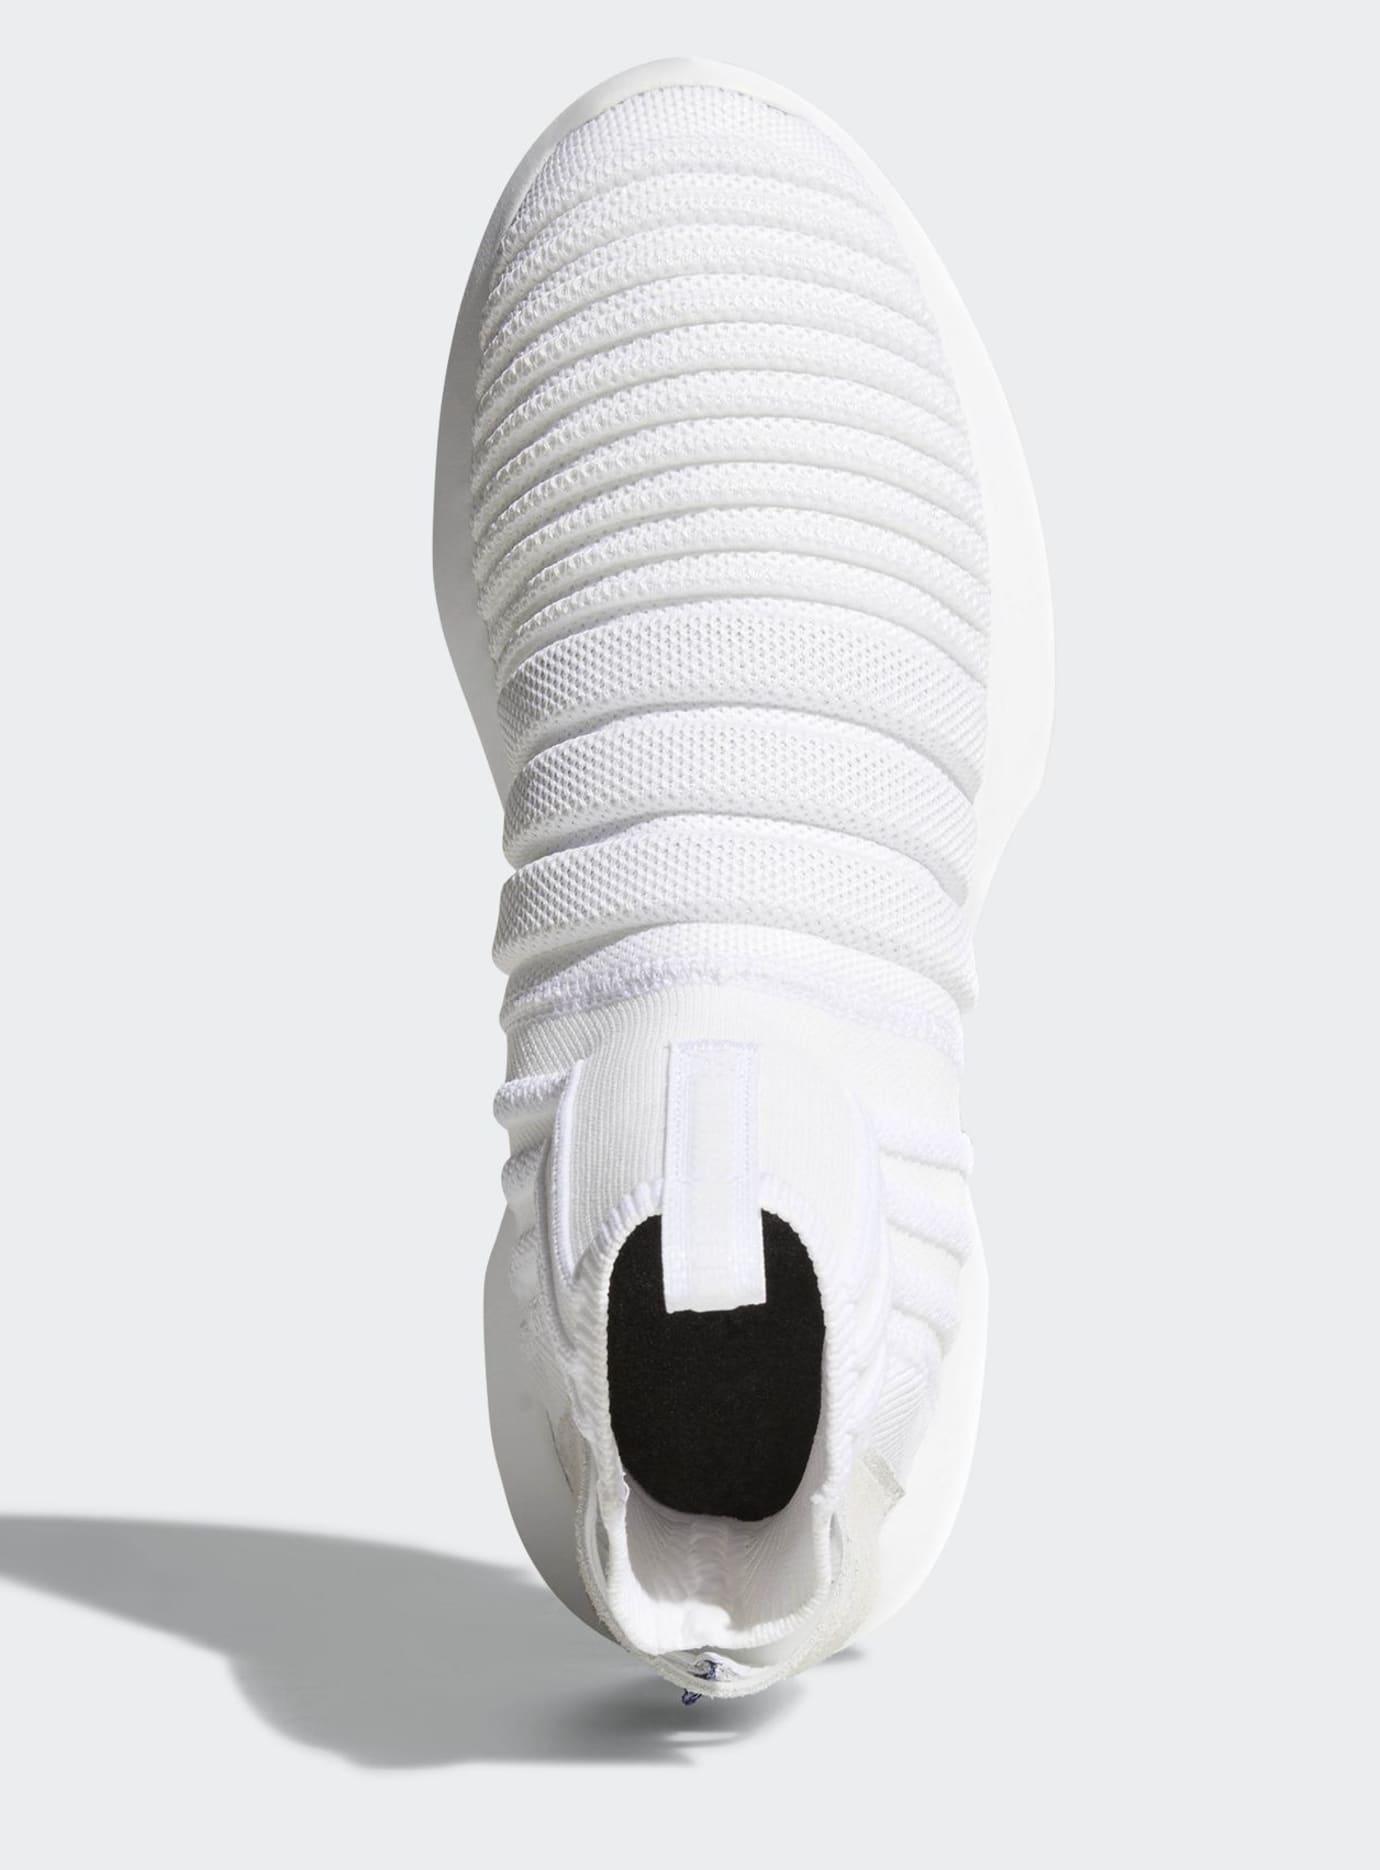 adidas-crazy-1-adv-sock-primeknit